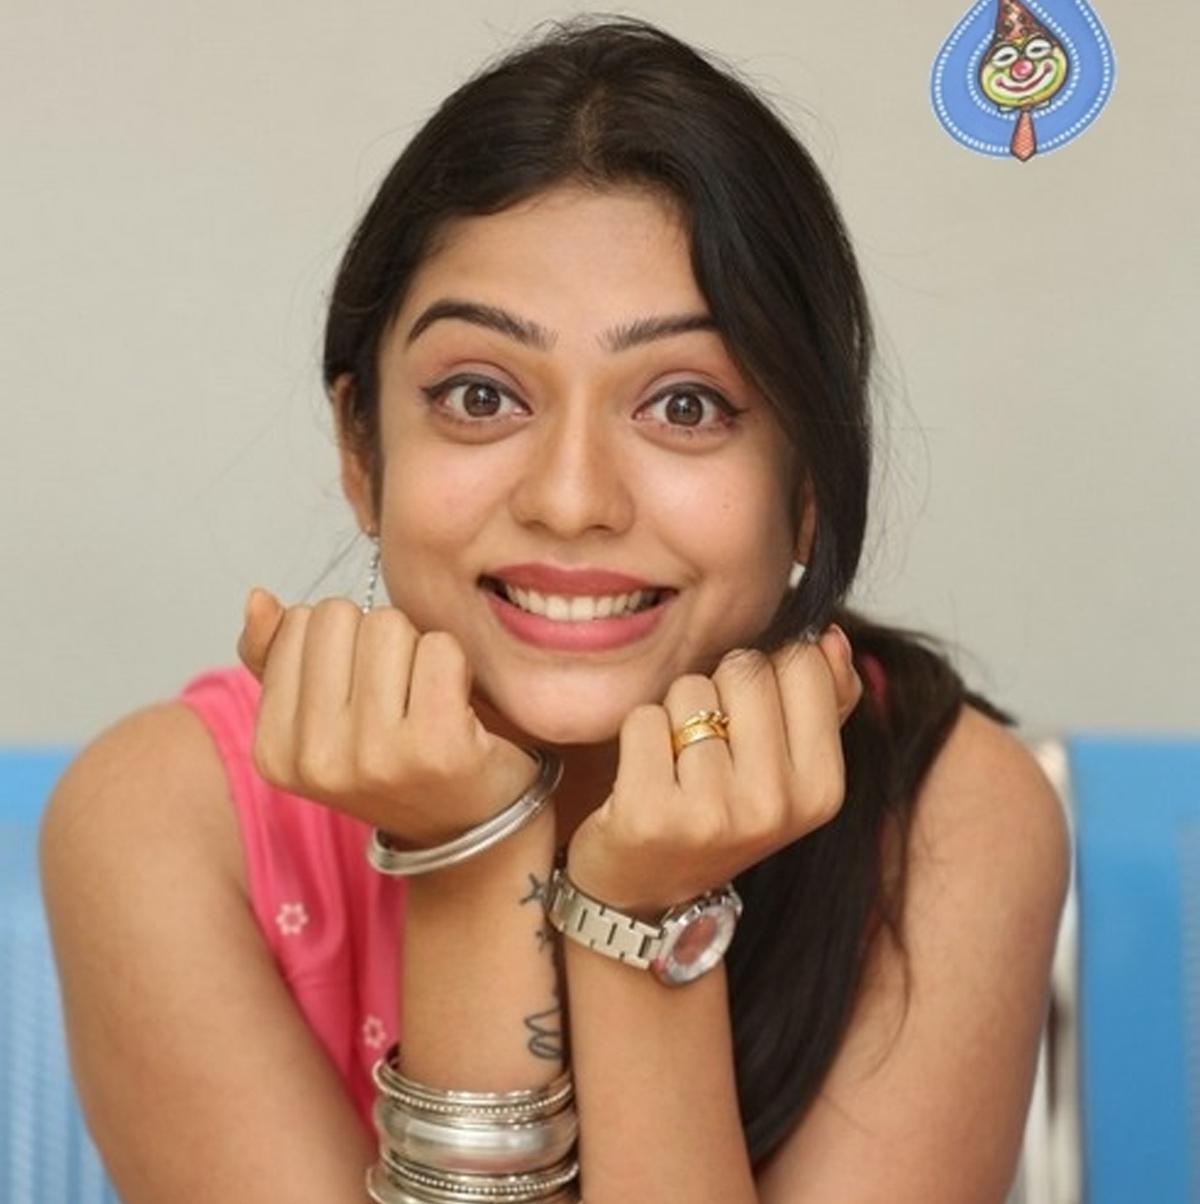 varsha bollamma,middle class melodies,special interview  ఎక్స్క్లూజివ్ ఇంటర్వ్యూ: వర్షా బొల్లమ్మ